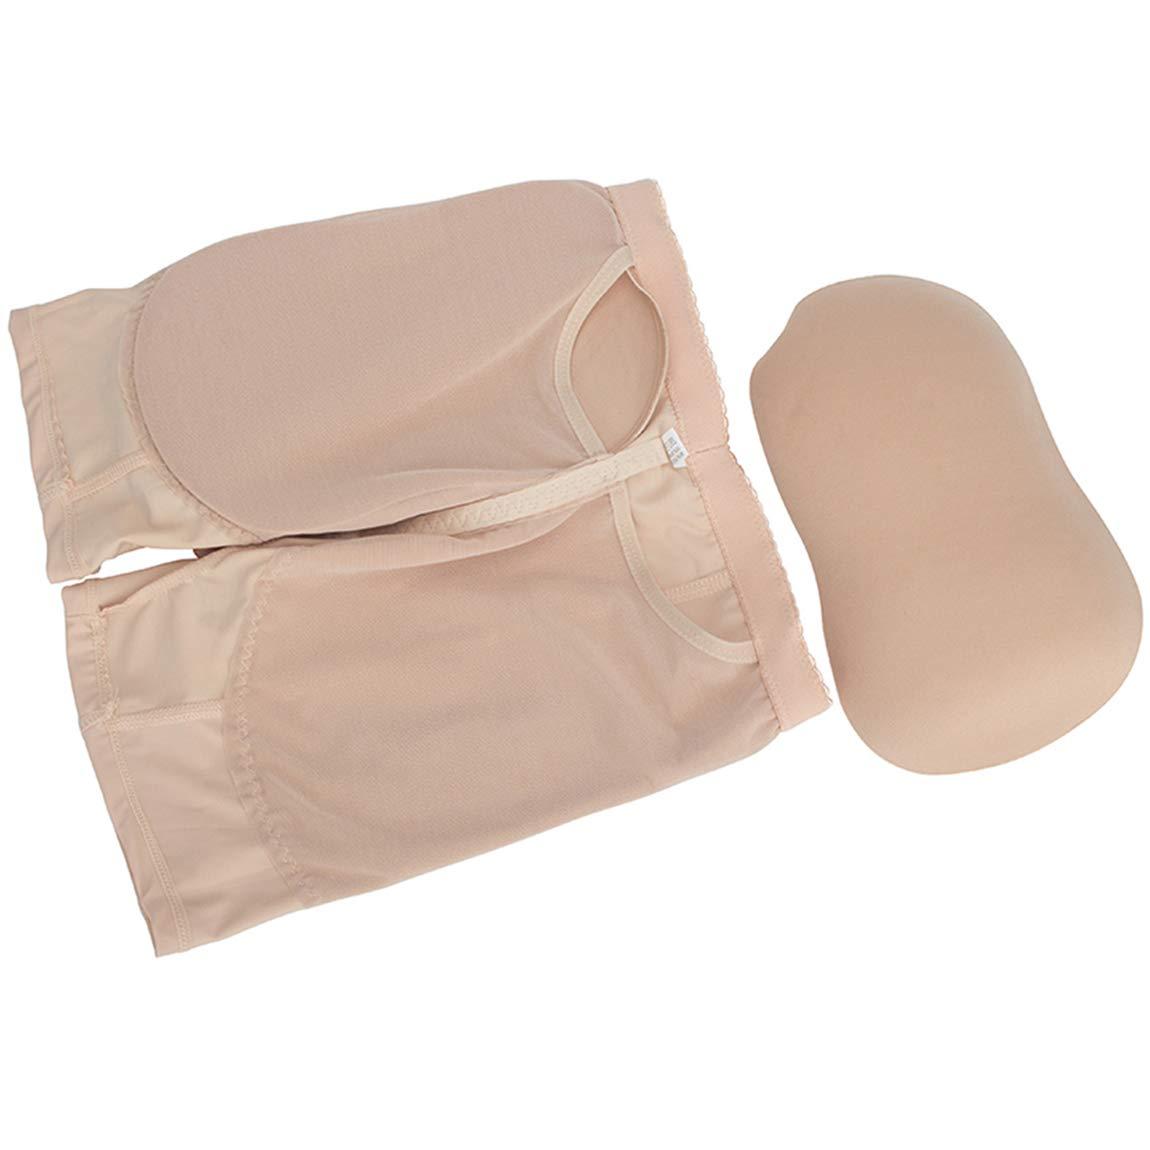 DODOING Womens Padded Panties Butt Lifter Hip Enhancer Underwear Control Panty